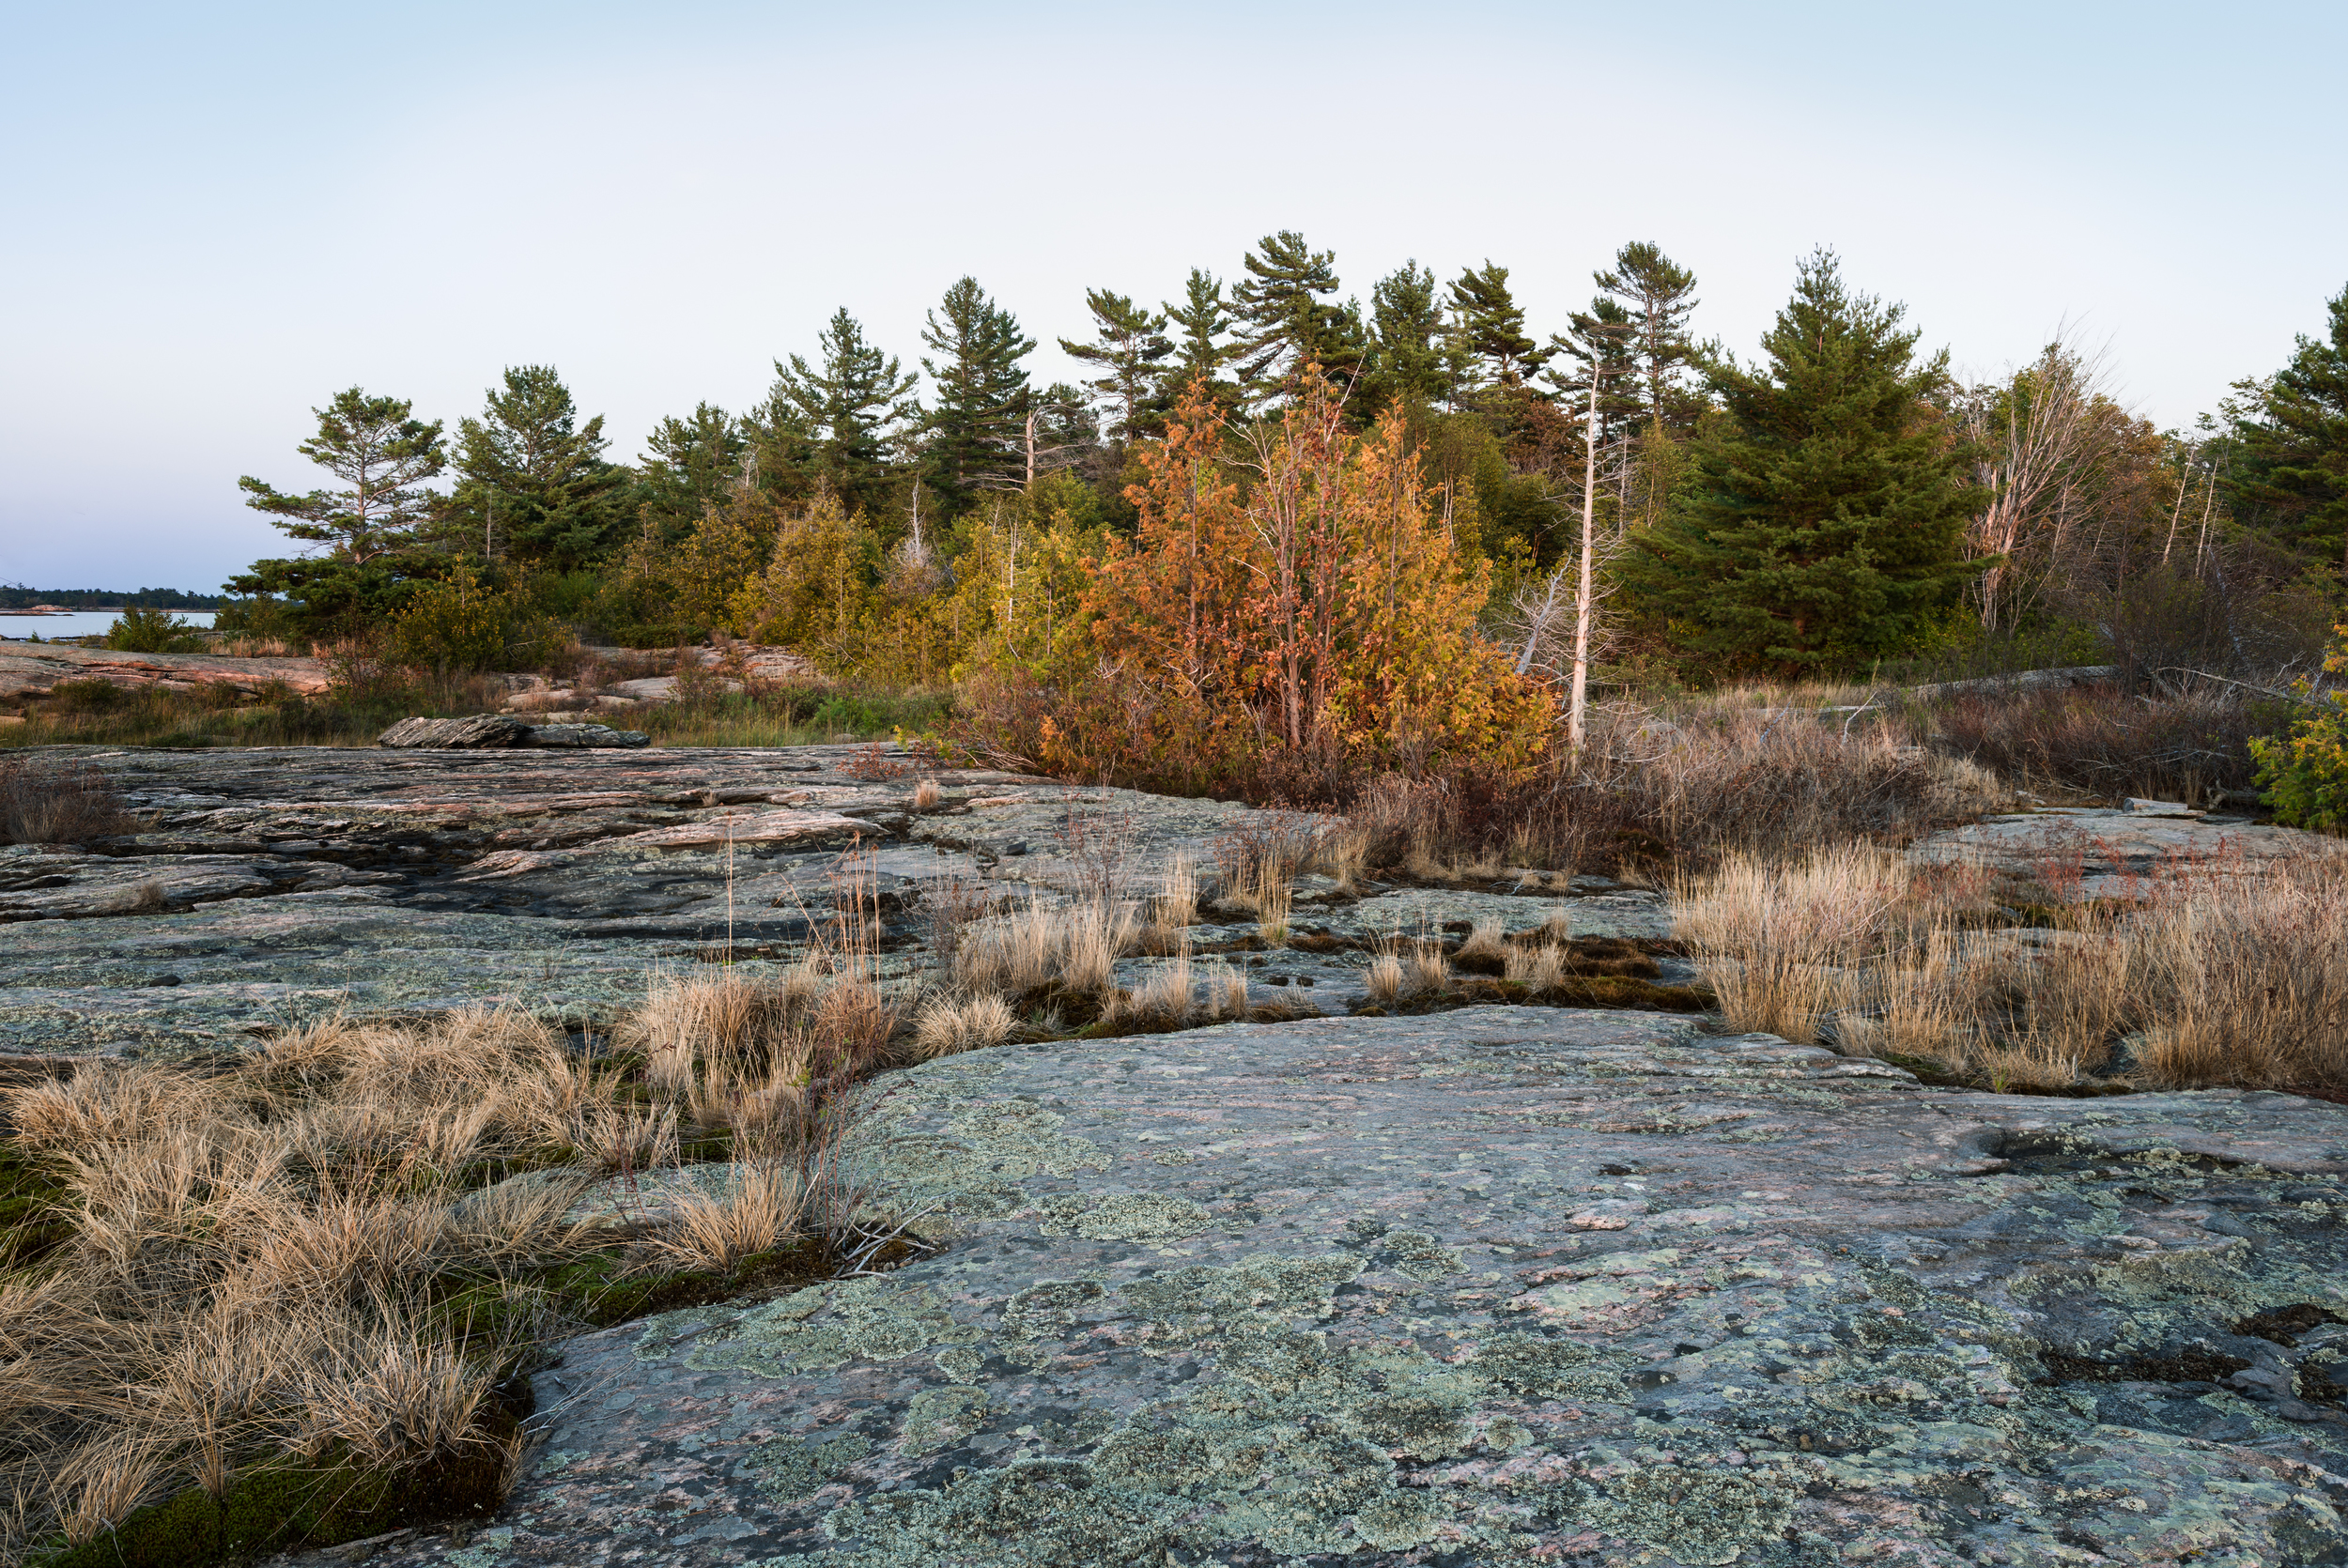 Dead Cedars after 2012 Drought Boundary Islands, Georgian Bay, Canada, UNESCO World Biosphere Reserve